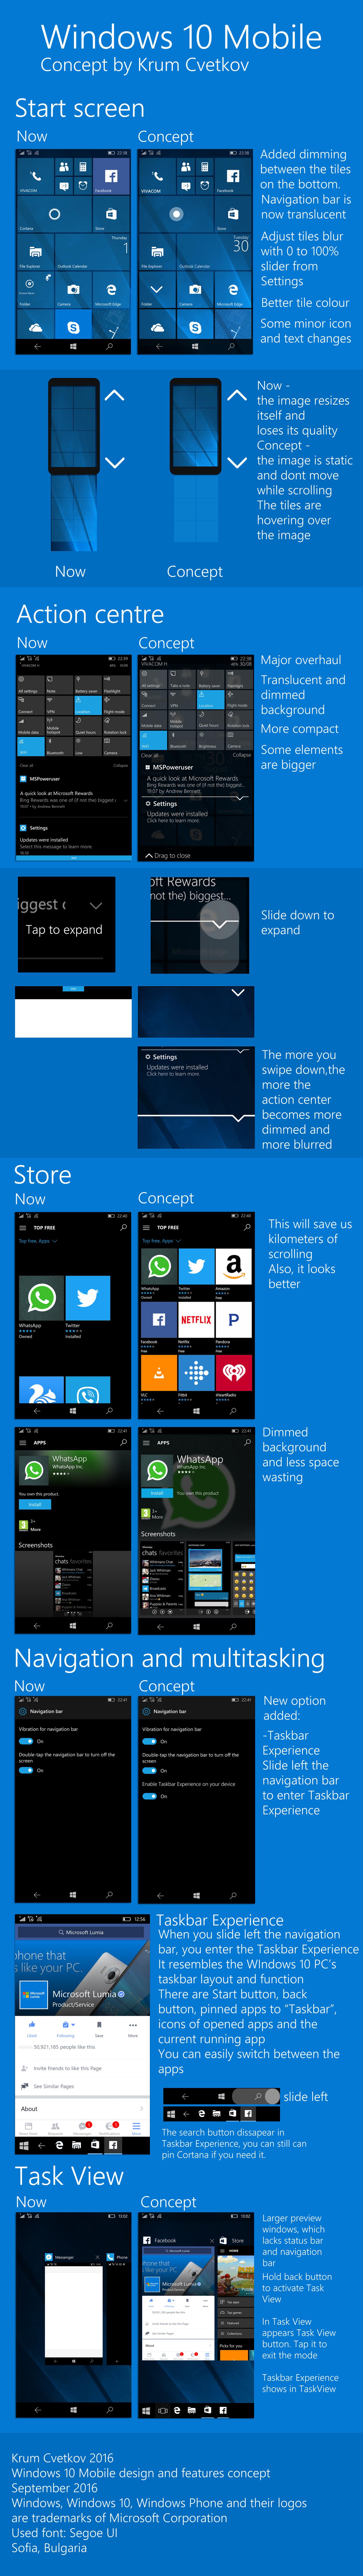 windows UI ux GUI phone windows phone windows 10 mobile Microsoft windows 10 concept